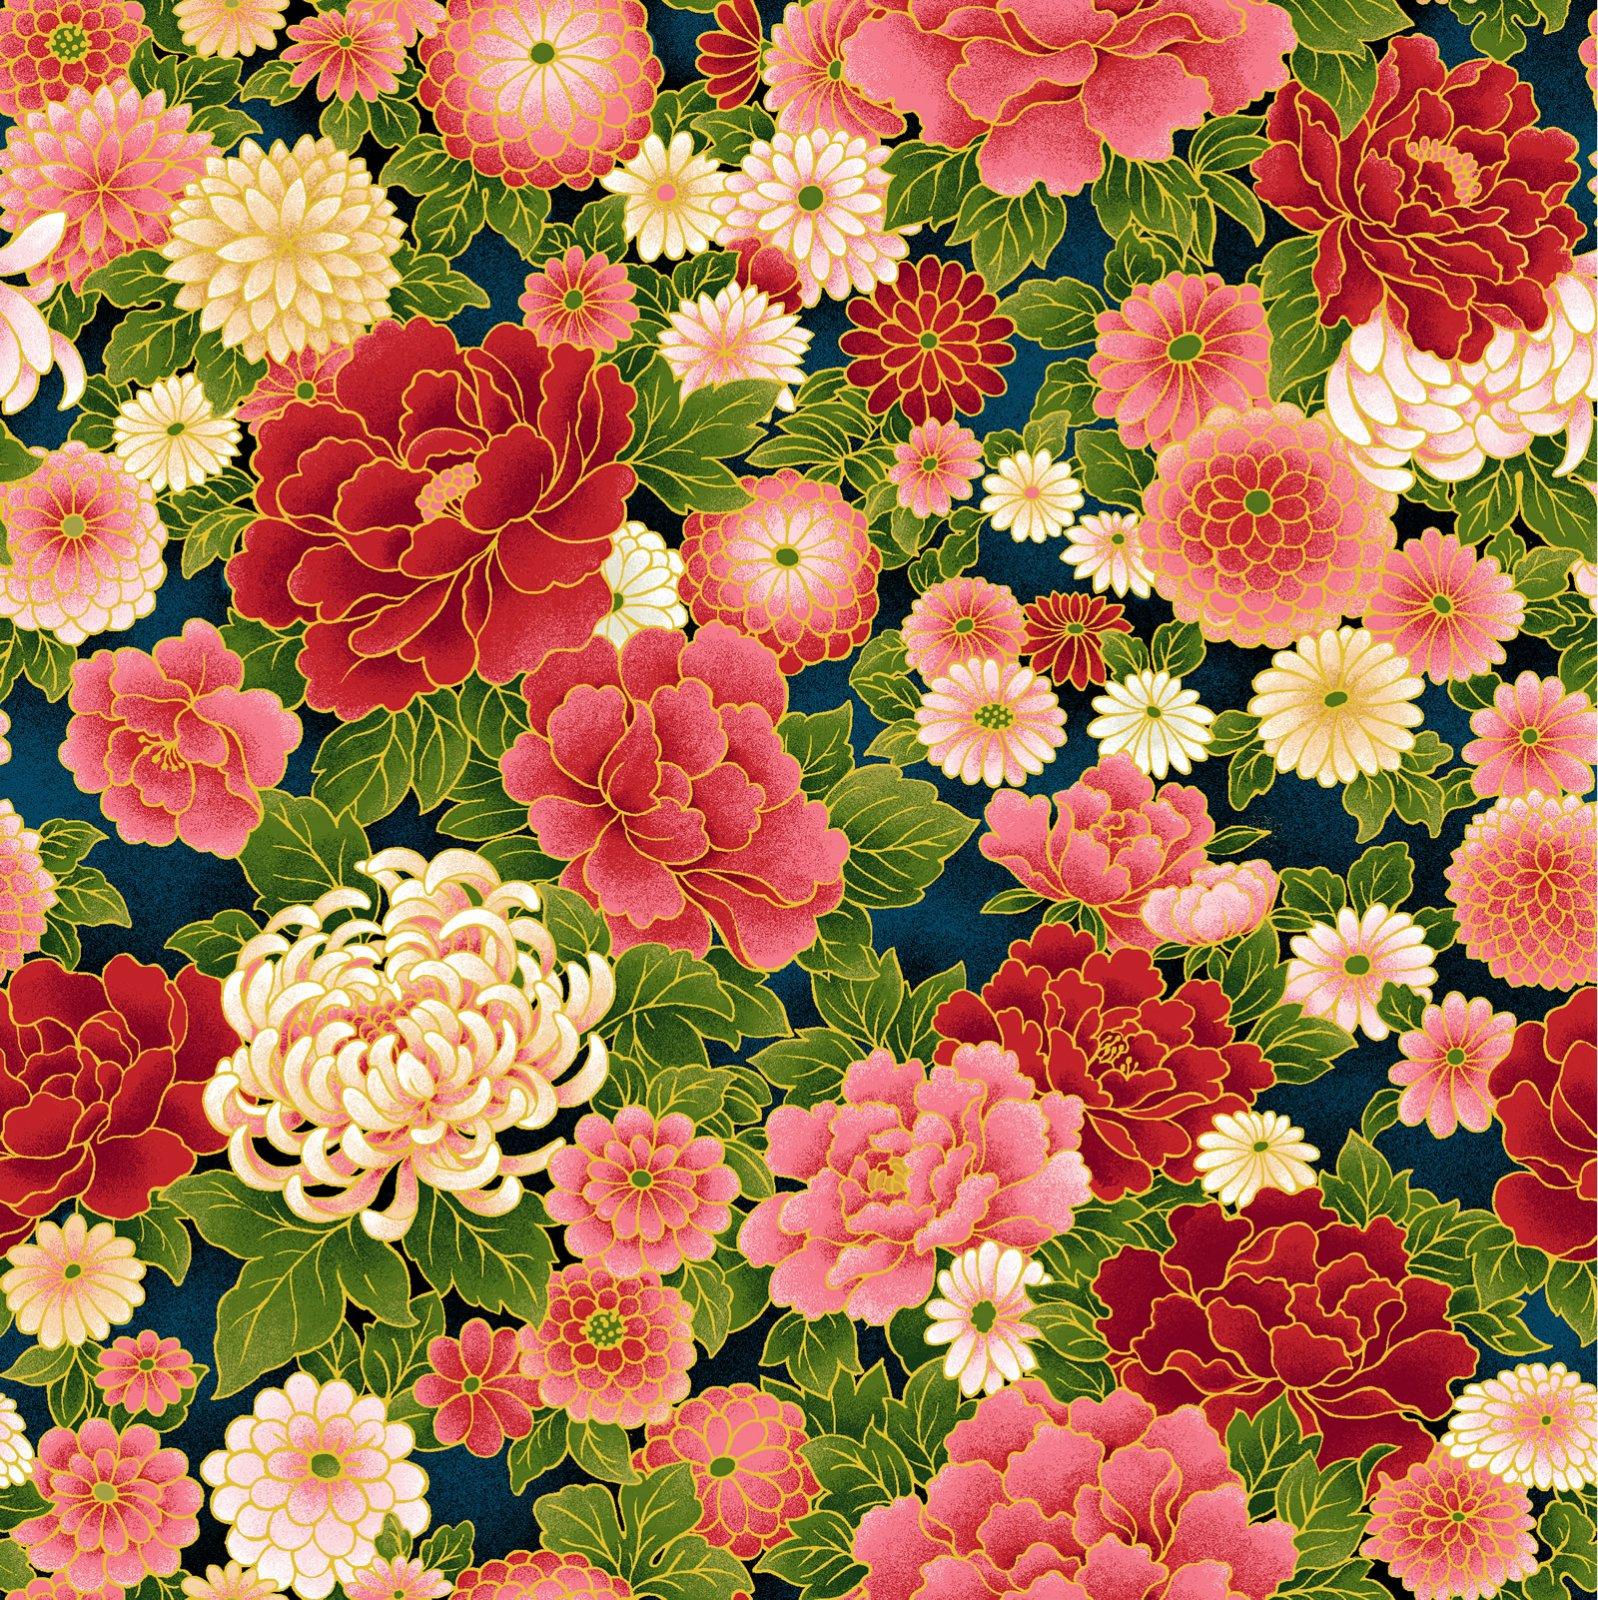 Wind Song by Oasis Fabrics (DA6026501)